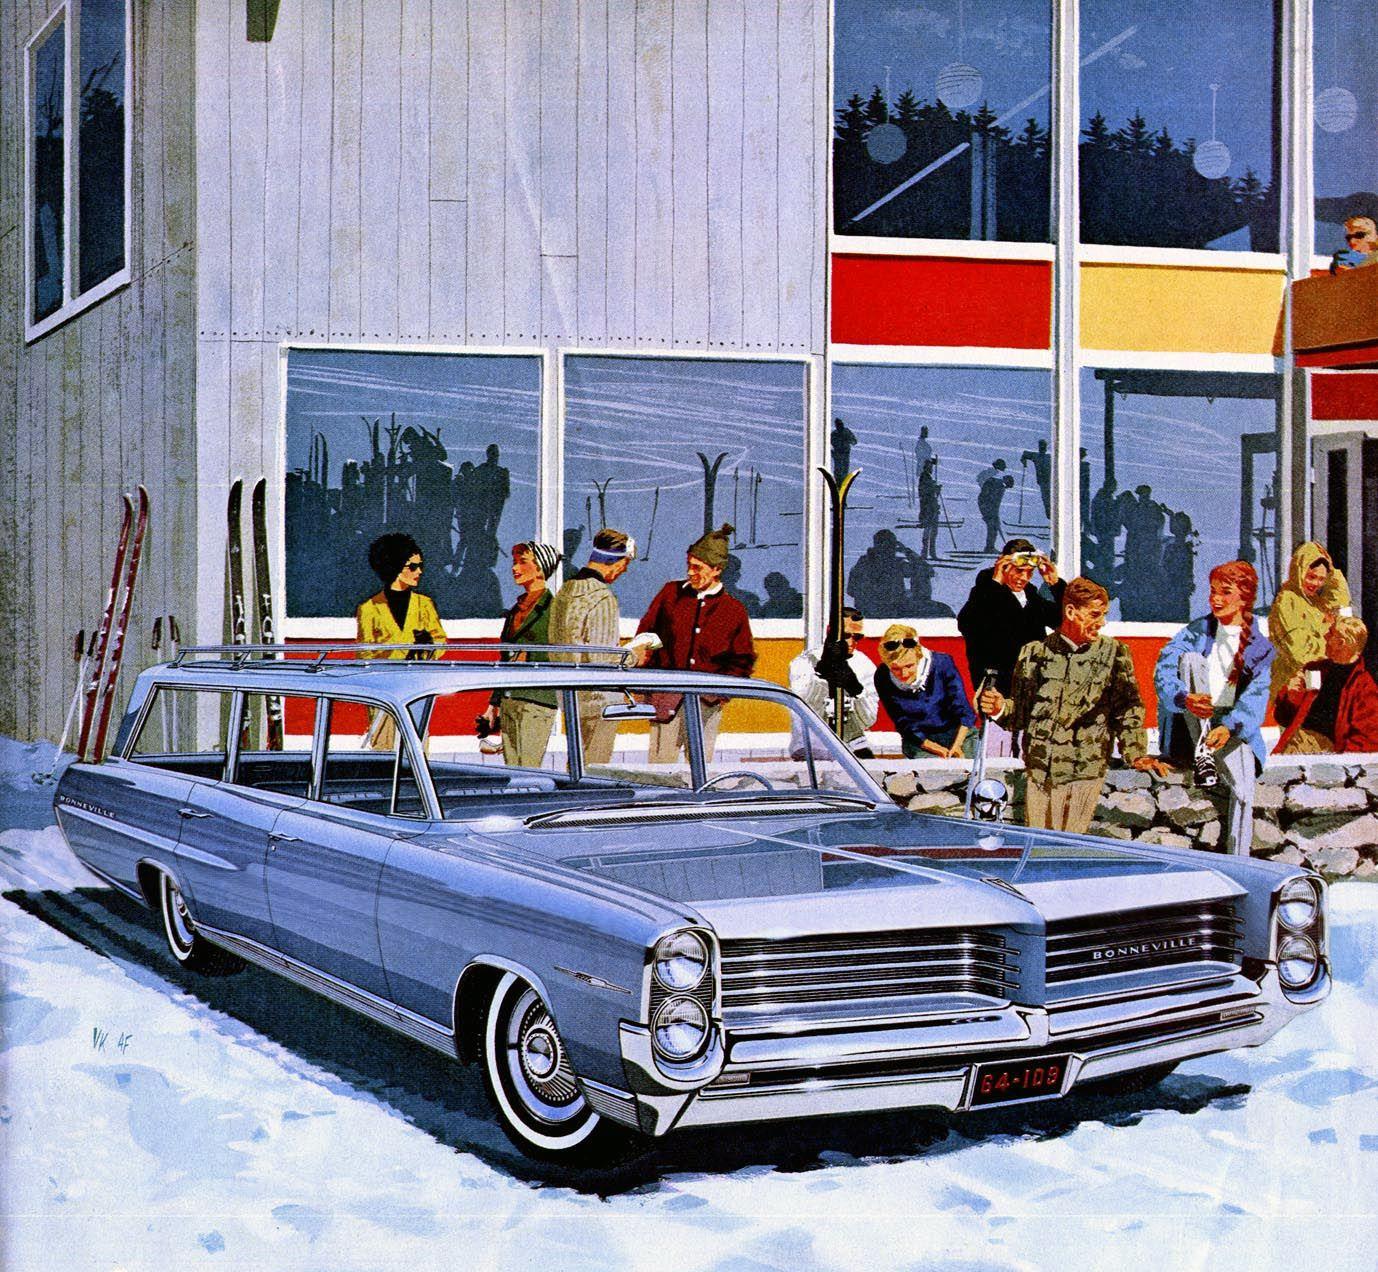 1964 Bonneville Safari - Ski New England